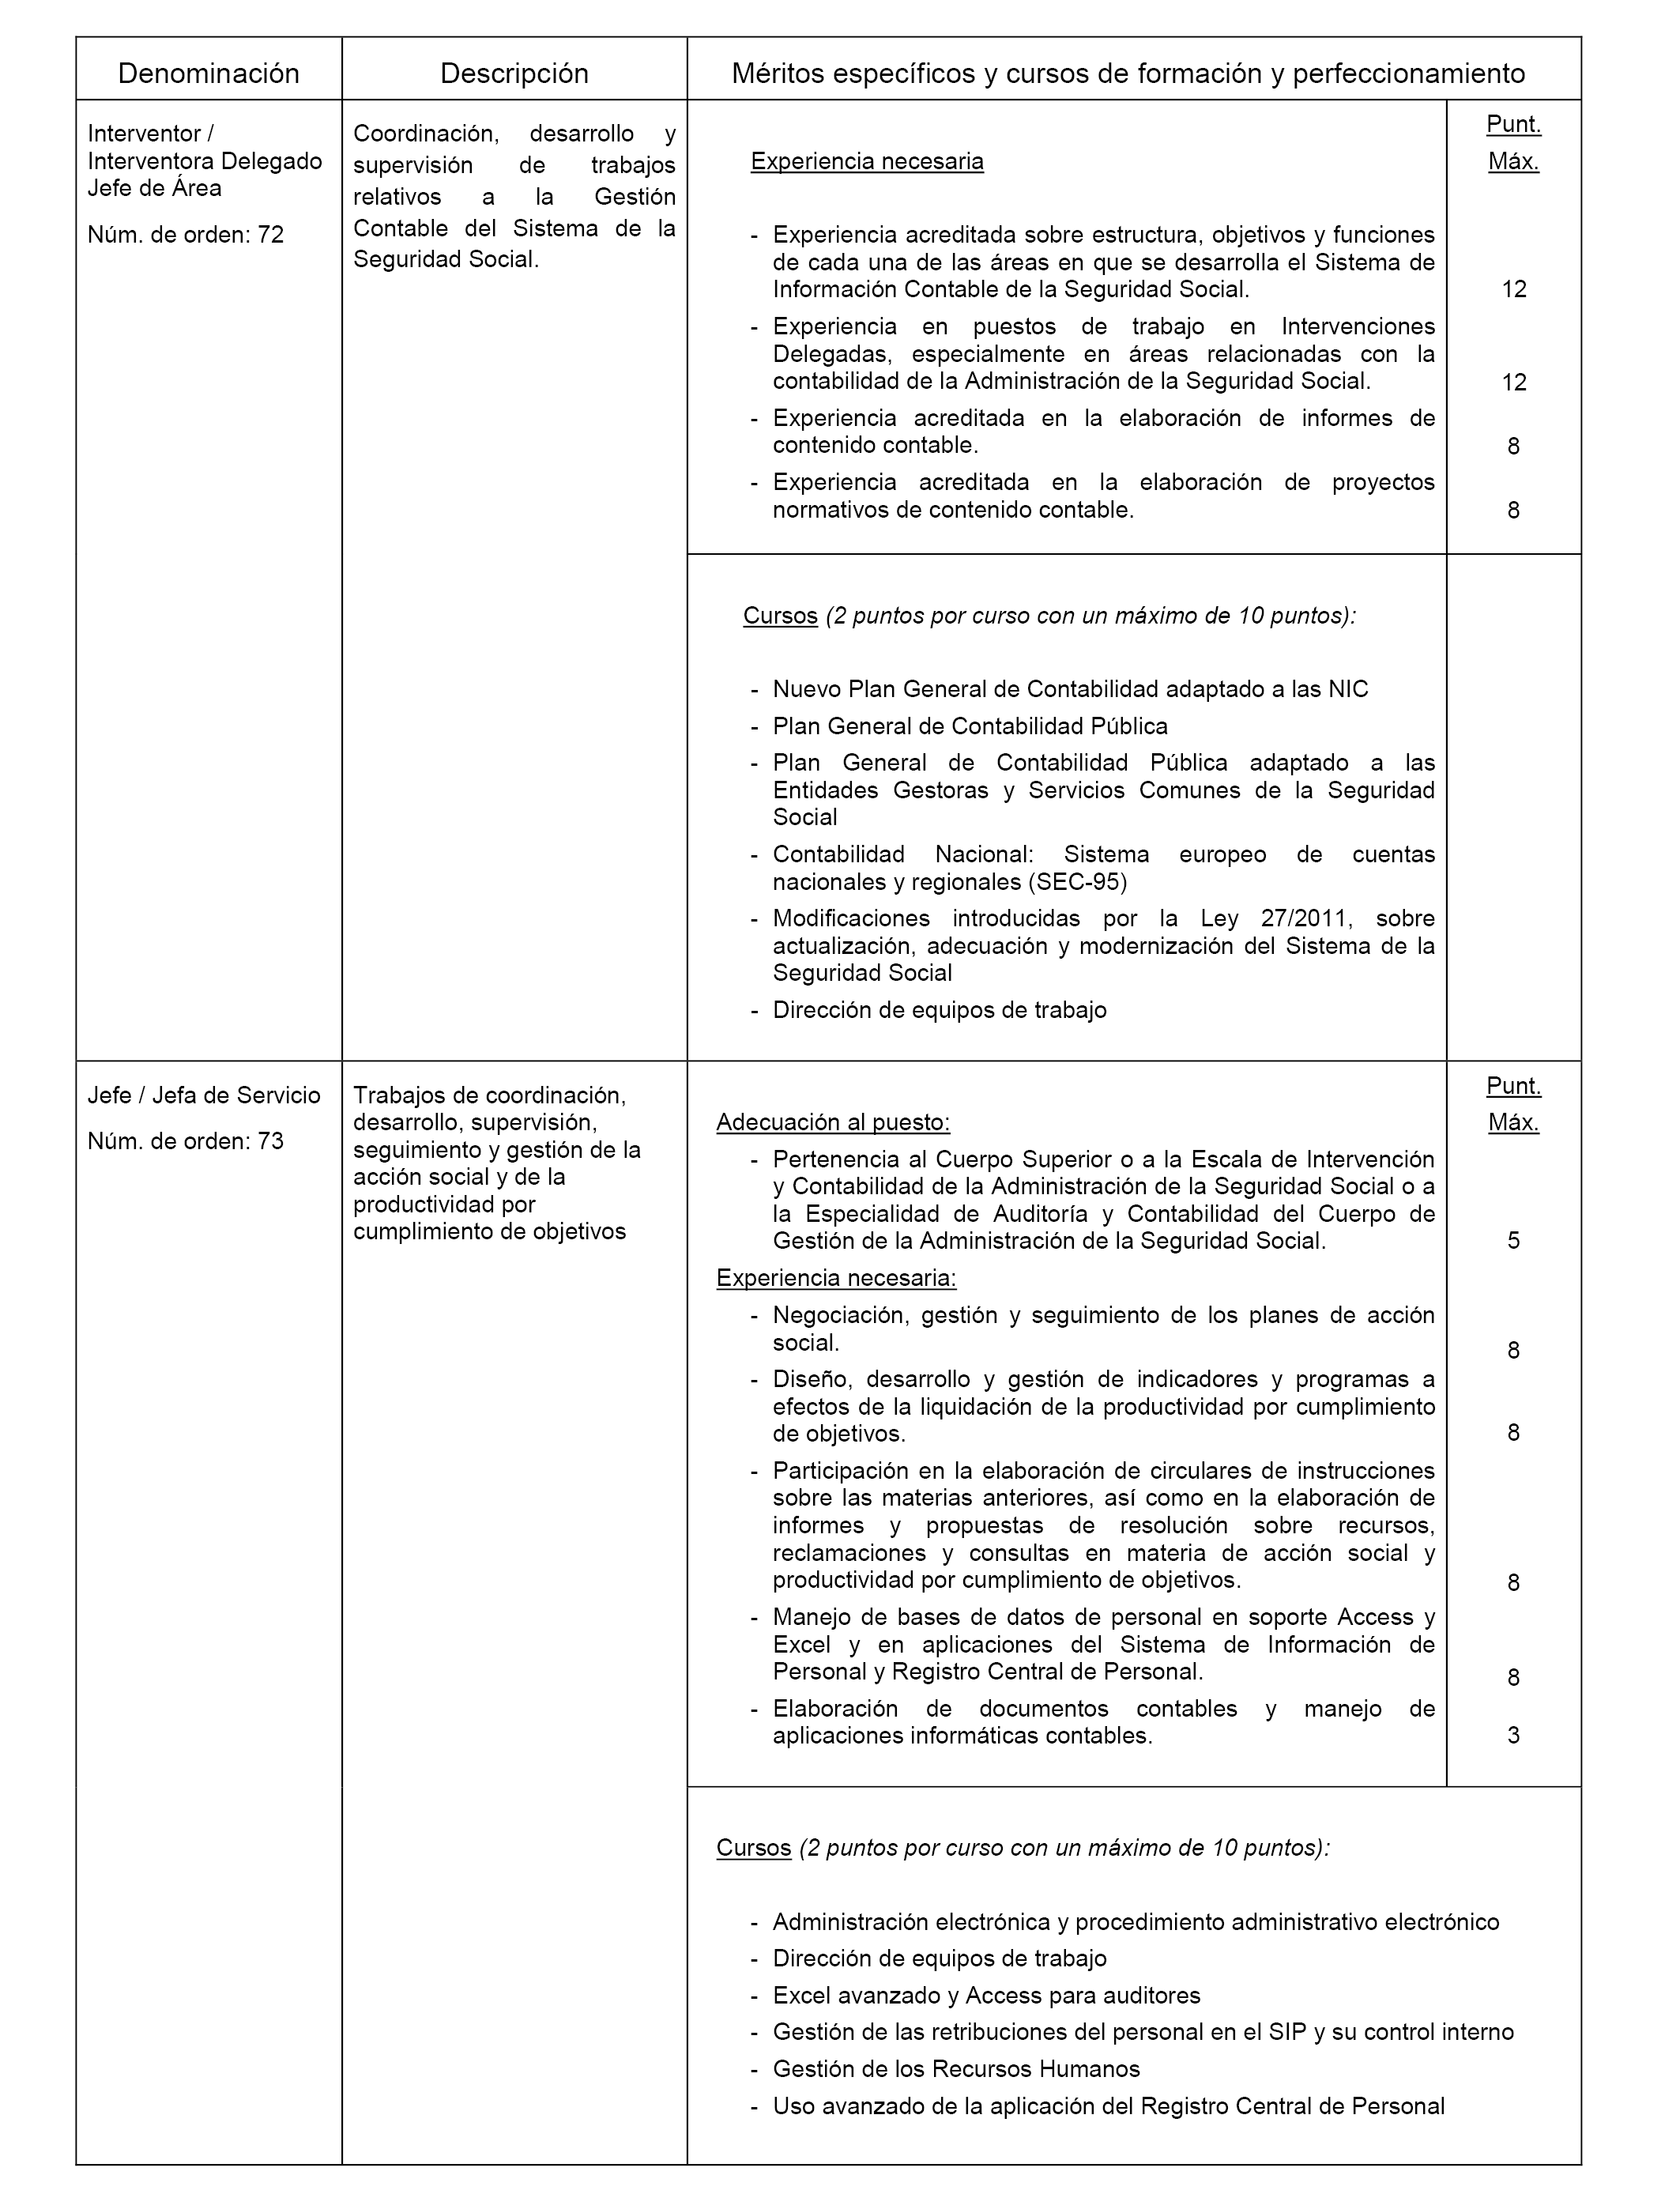 BOE.es - Documento BOE-A-2016-5463